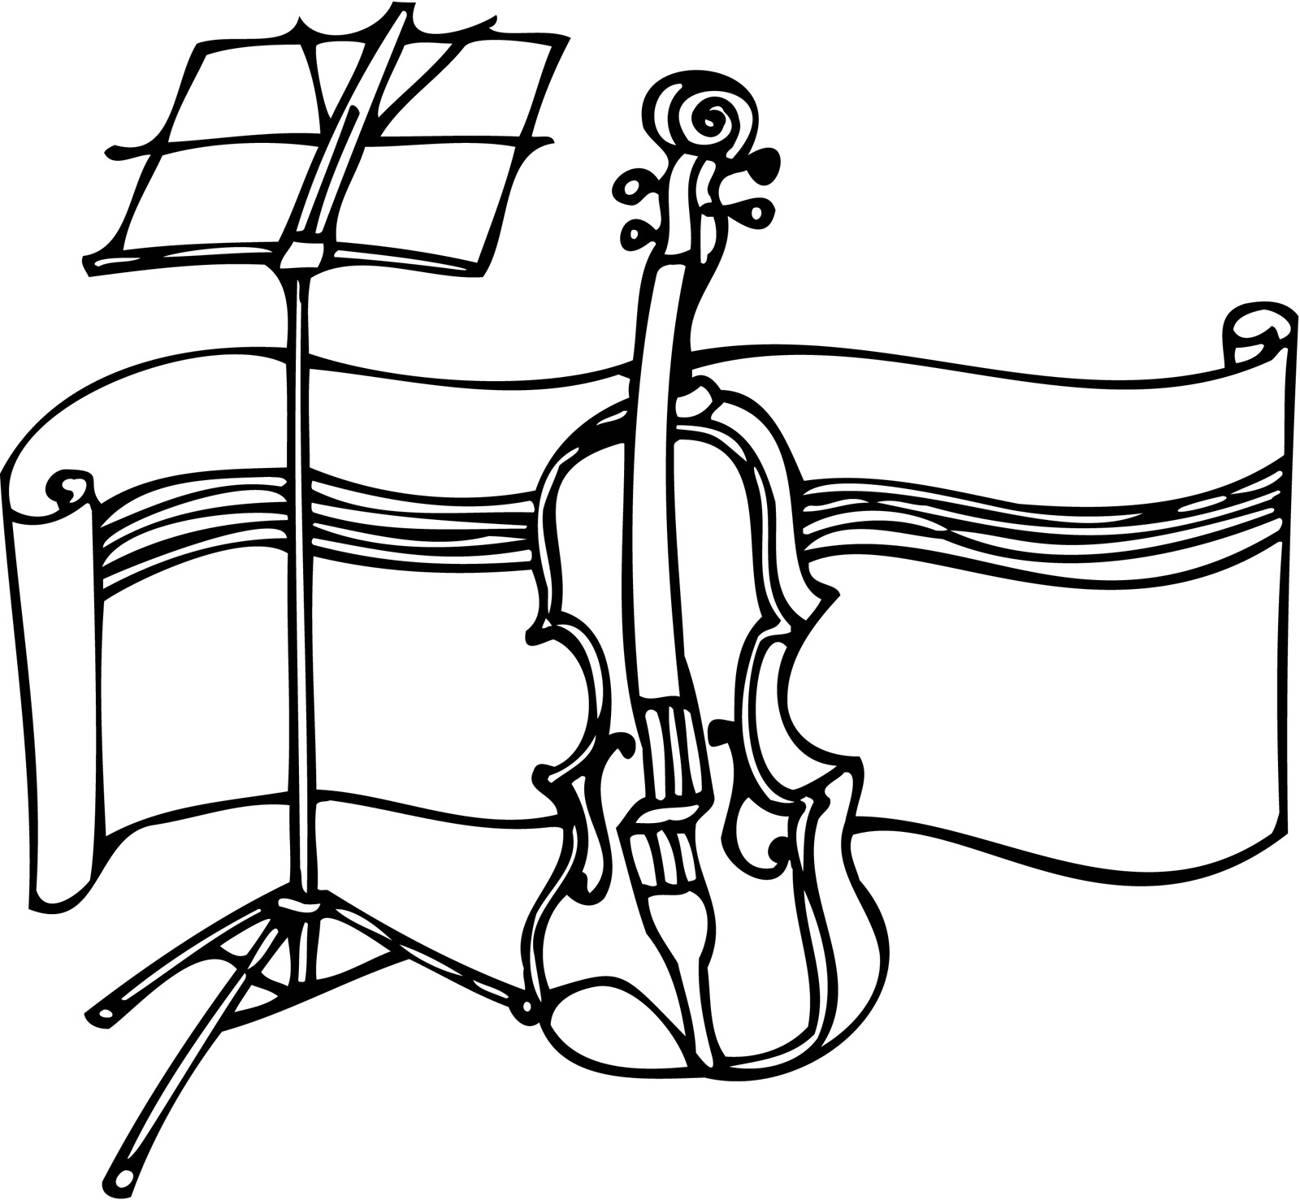 MUSIC-058